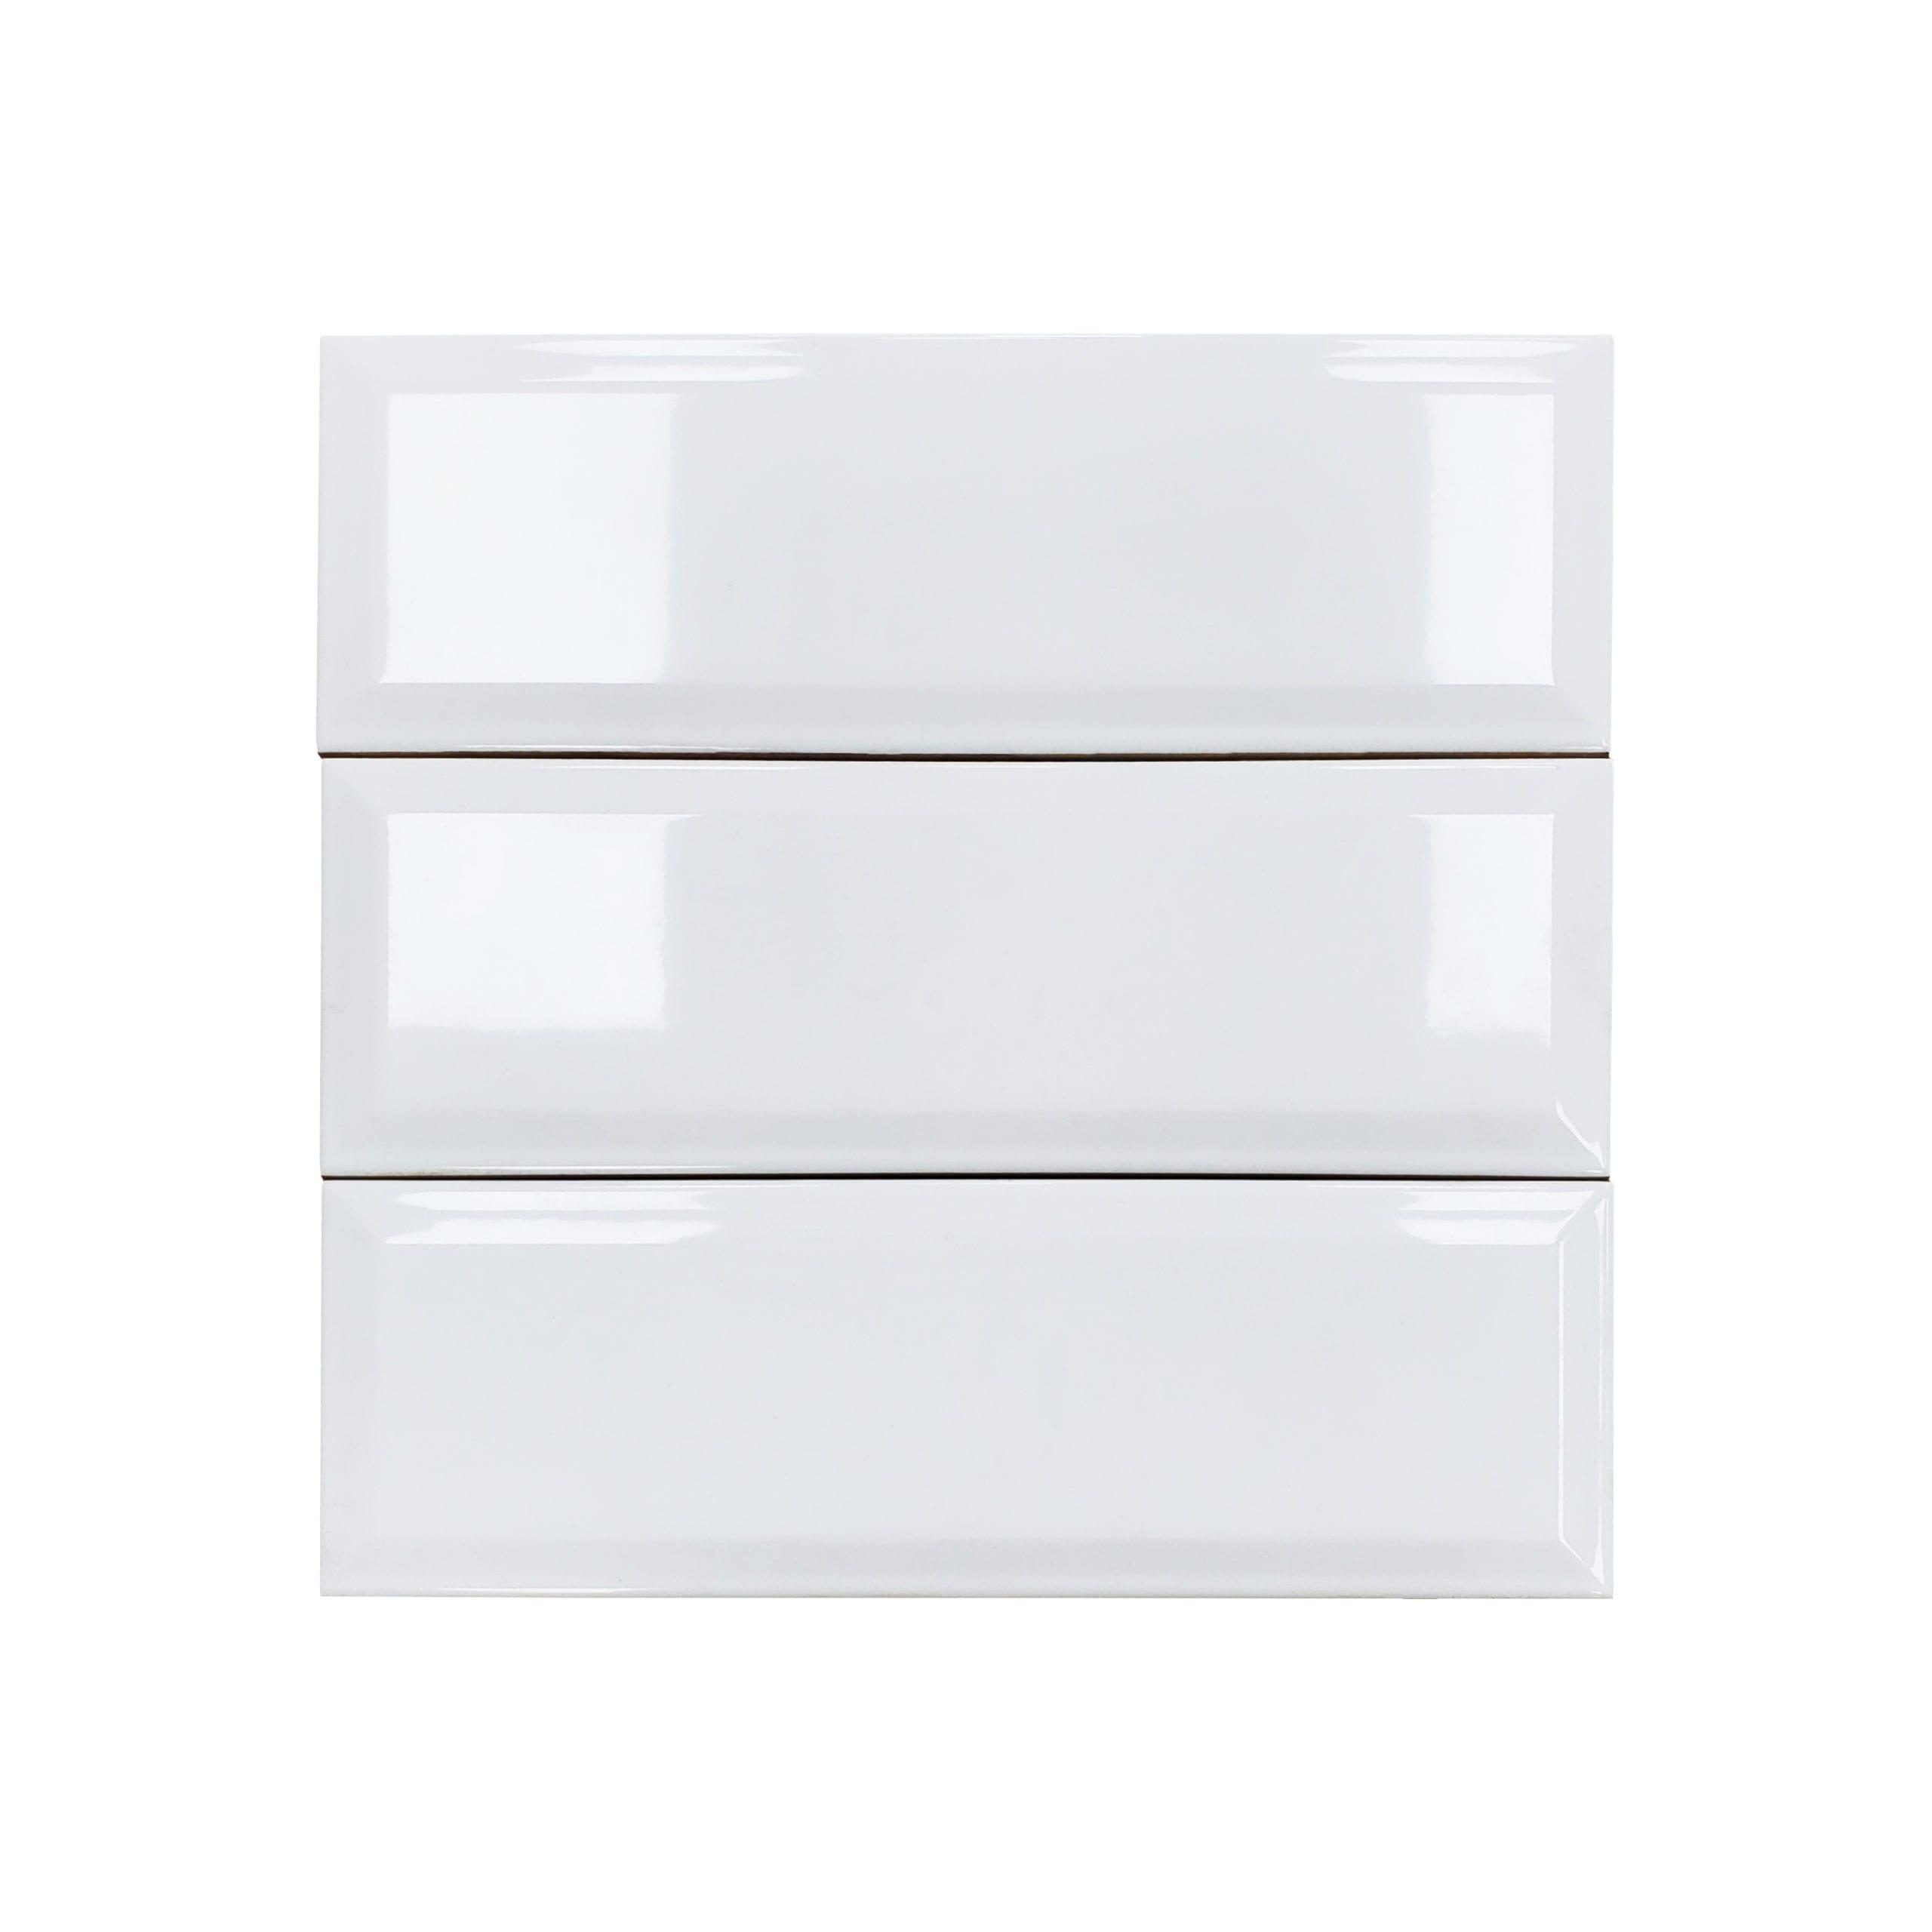 4×12 Soho Beveled_White Glossy_1.99